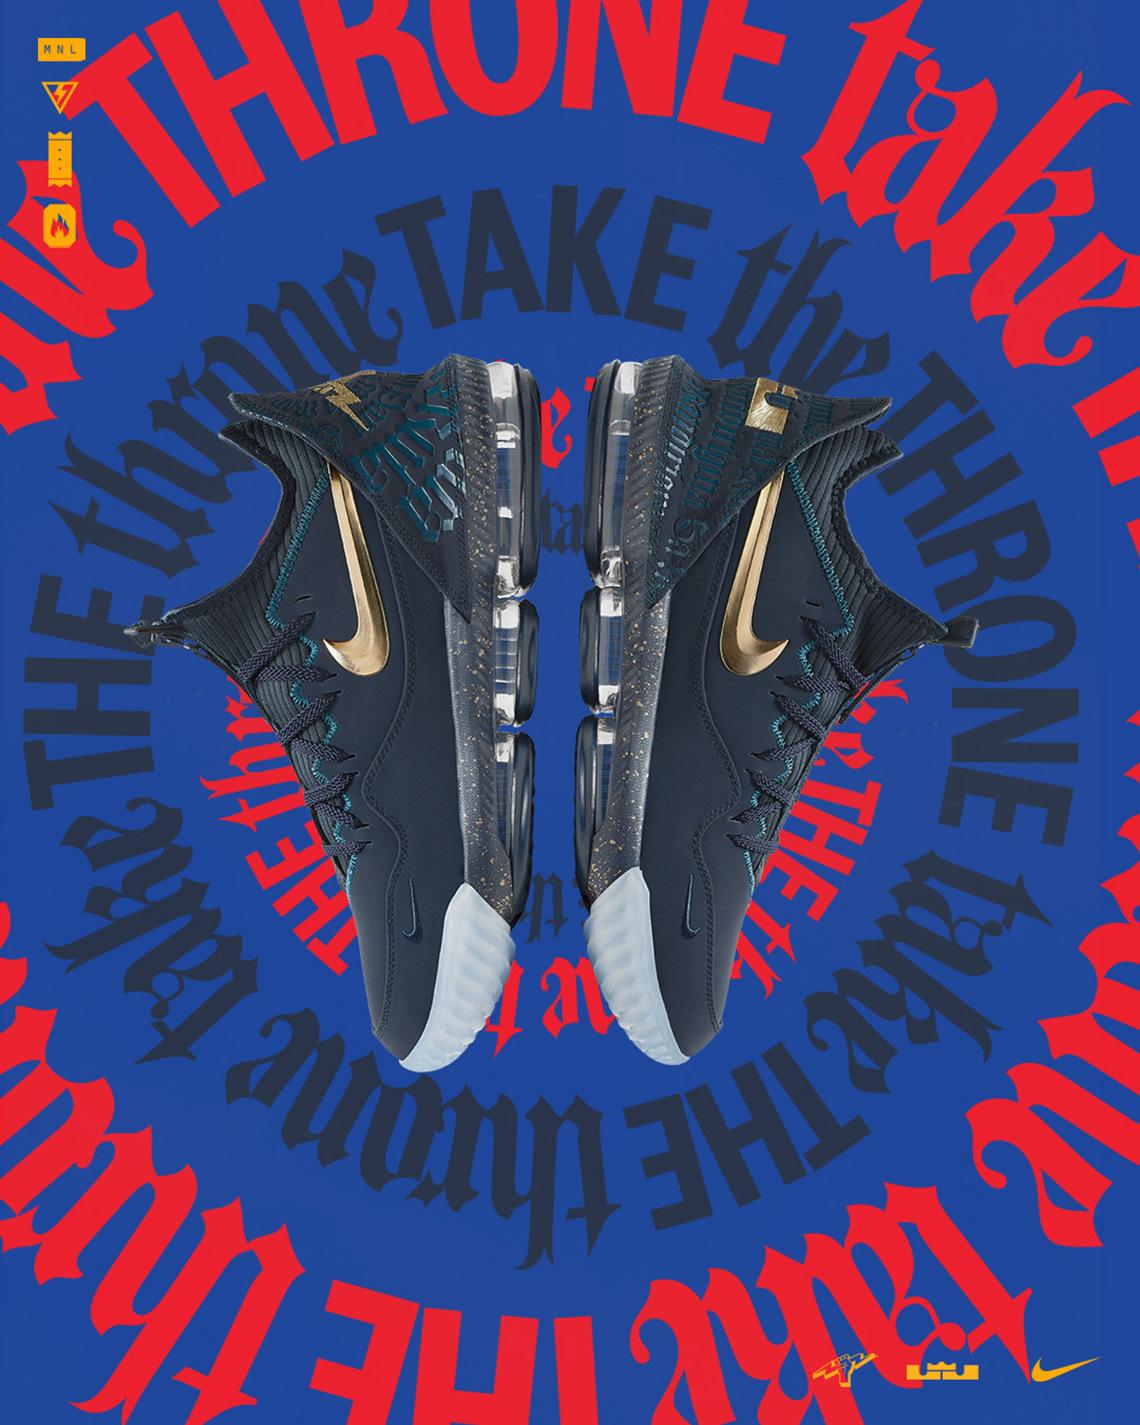 Nike Lebron 16 Low Agimat Release Date Sneakernews Com